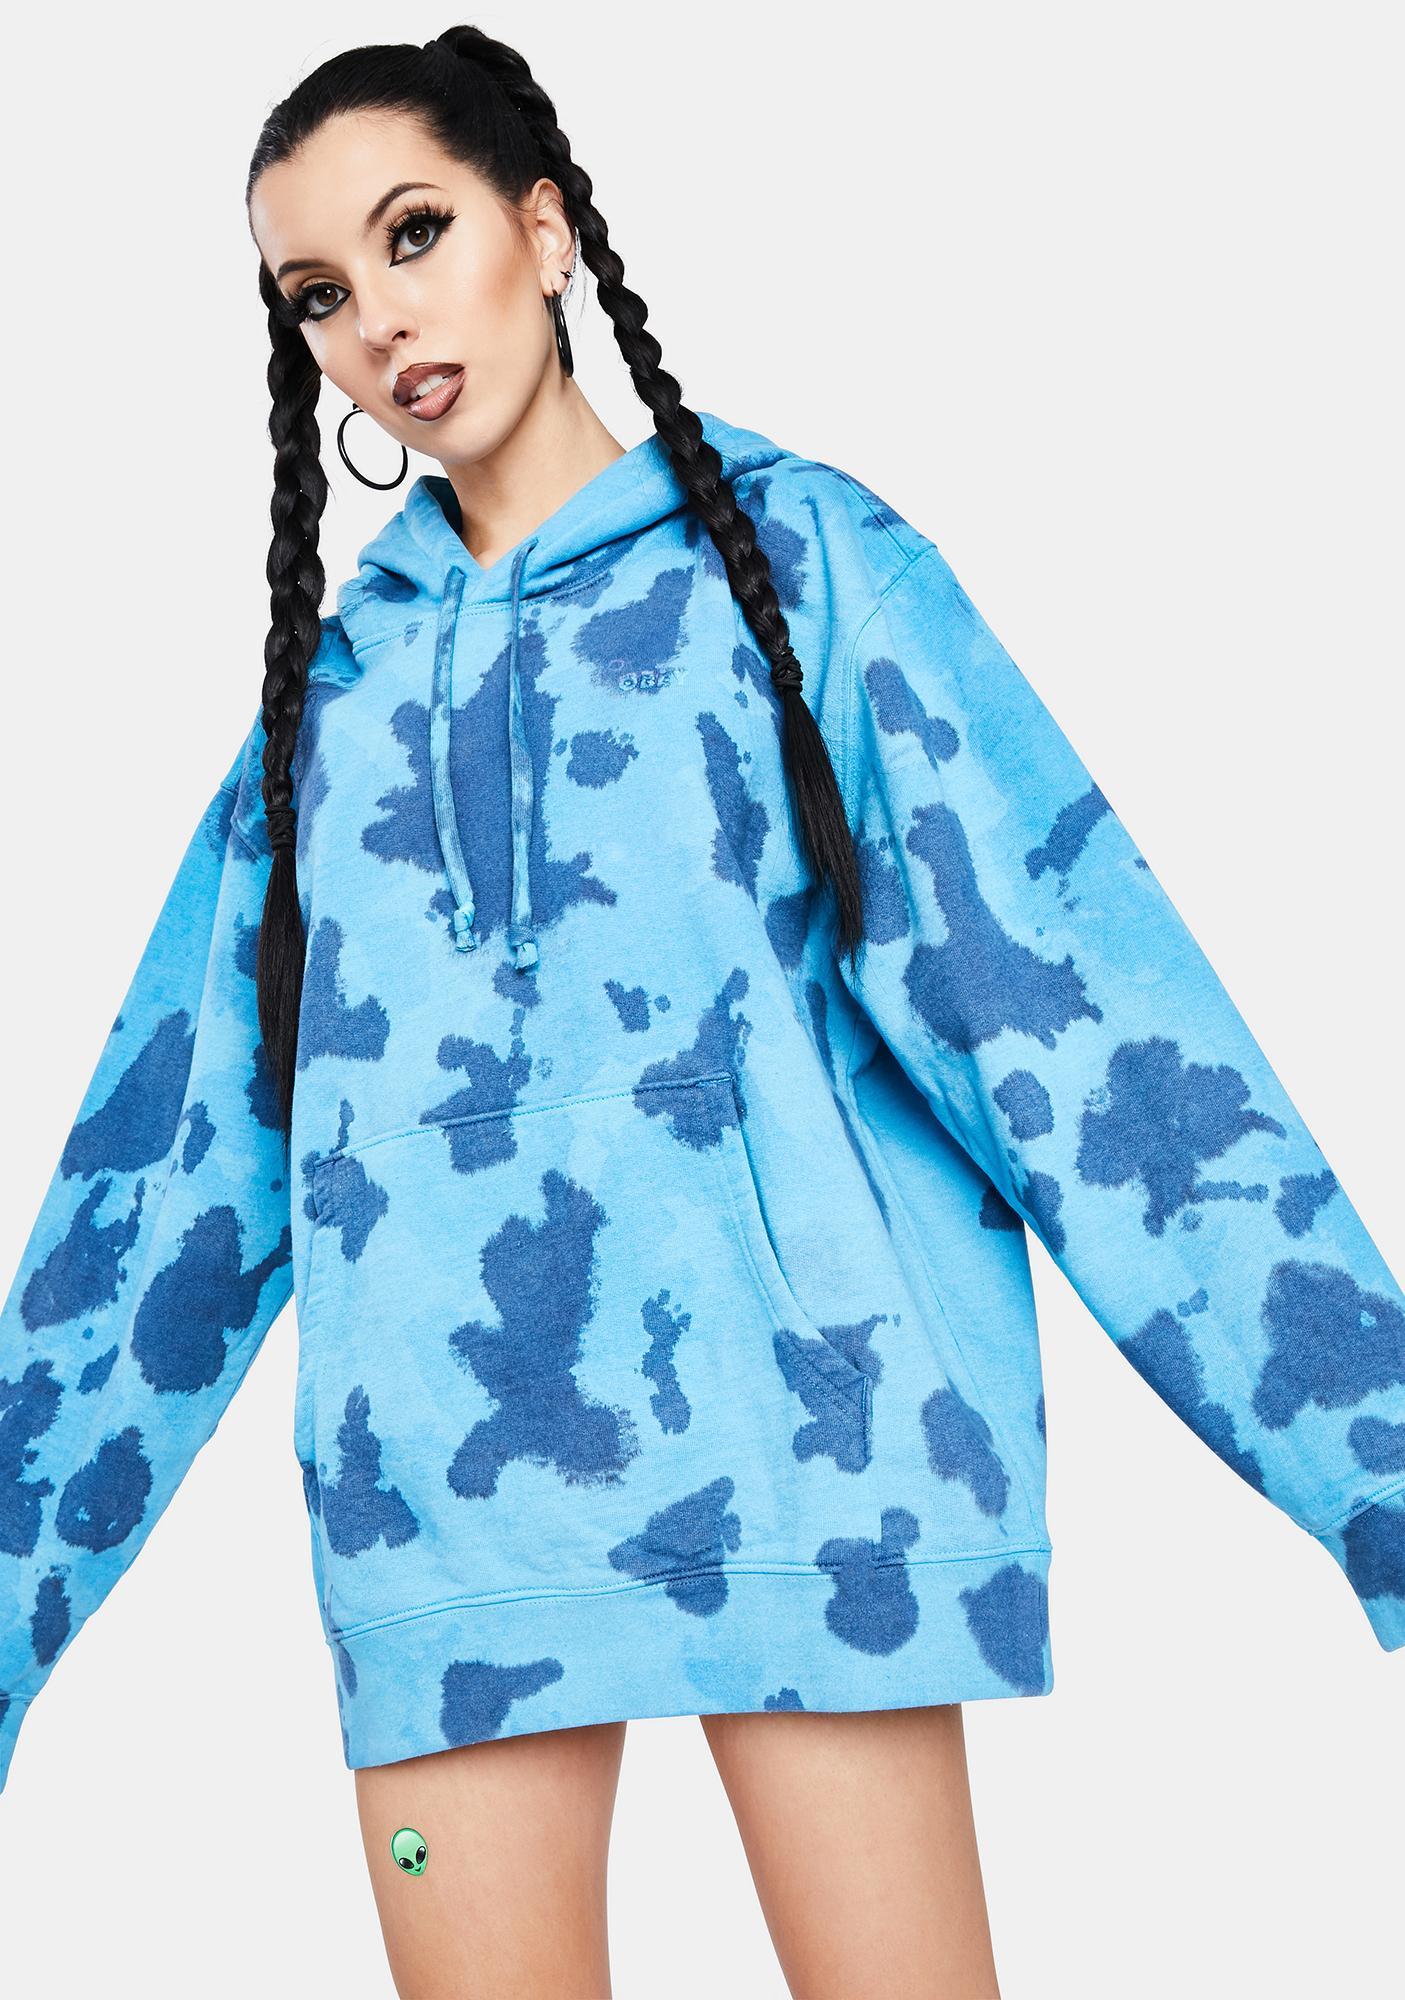 Obey Sustainable Tie Dye Fleece Hoodie